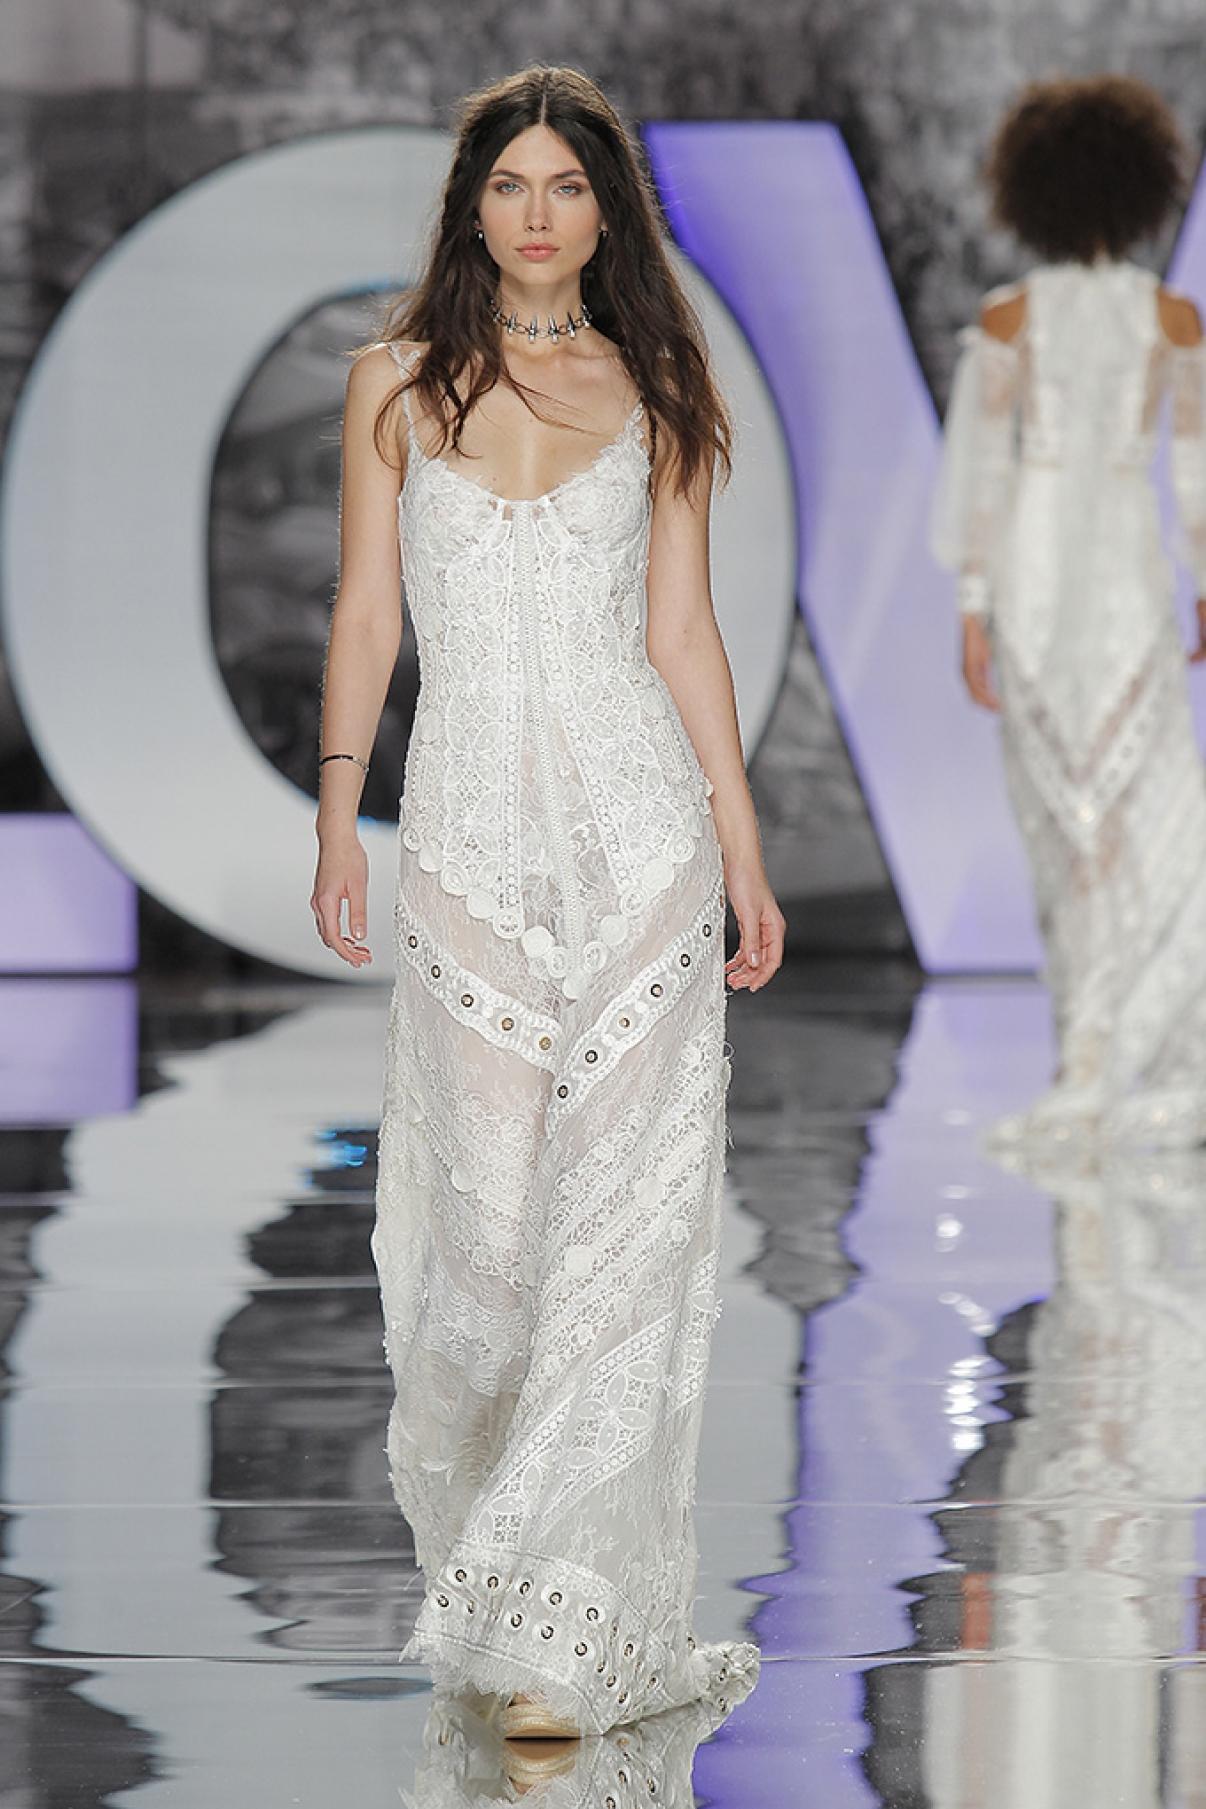 yolancris-weddingdress-bride-boho-chic-folk-wedding-dress-couture-fashion-desing-bohodress-83.jpg